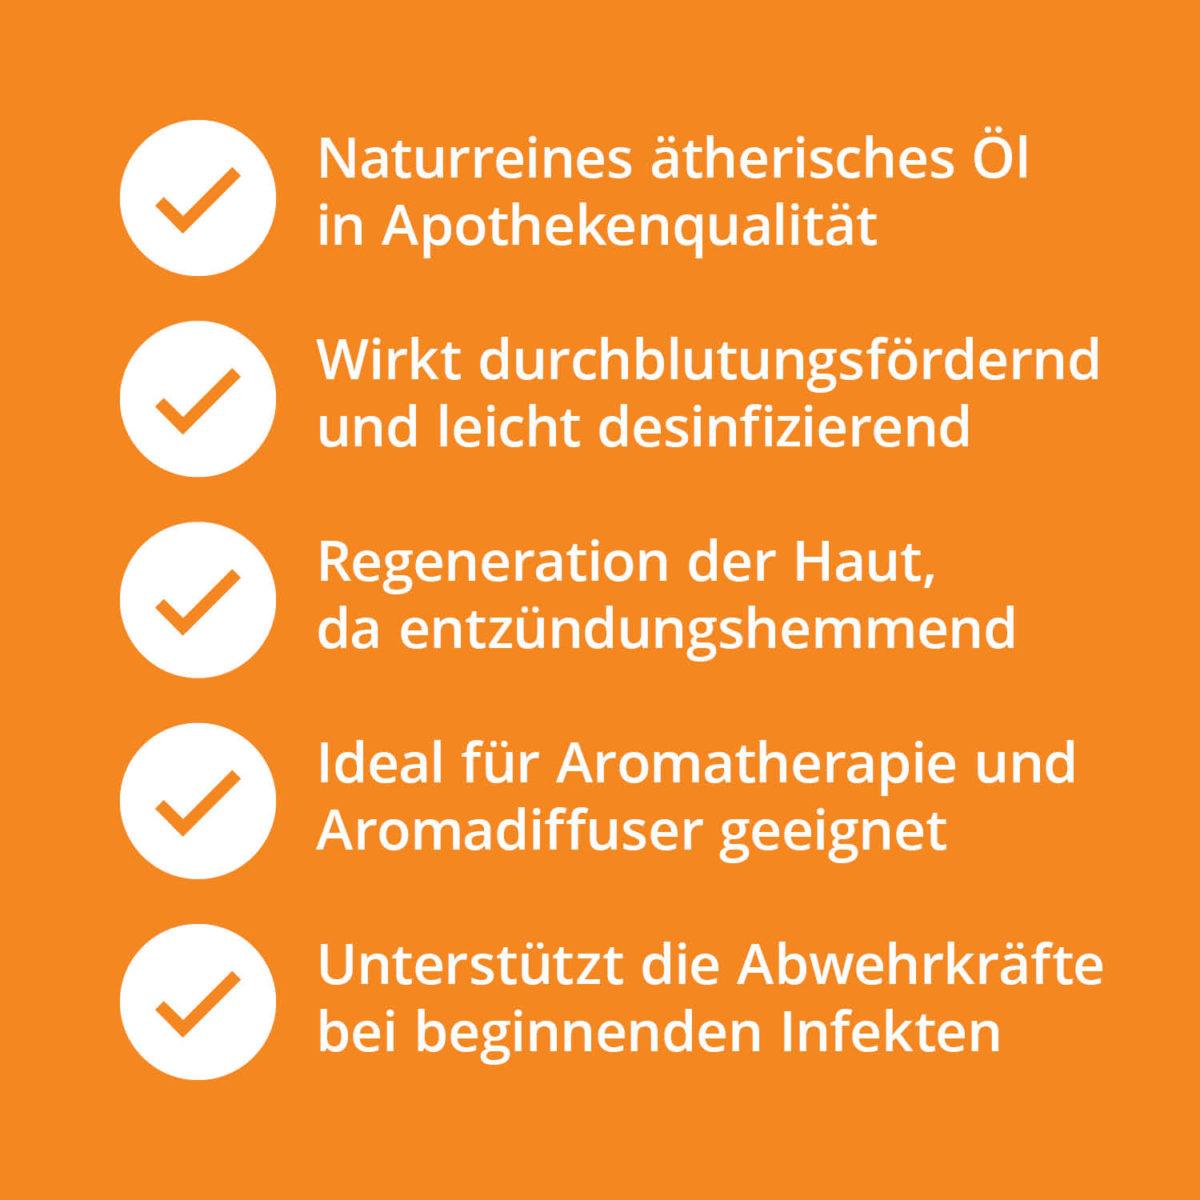 Casida Orangenöl naturrein – 10 ml 15880745 PZN Apotheke ätherische Öle Diffuser8